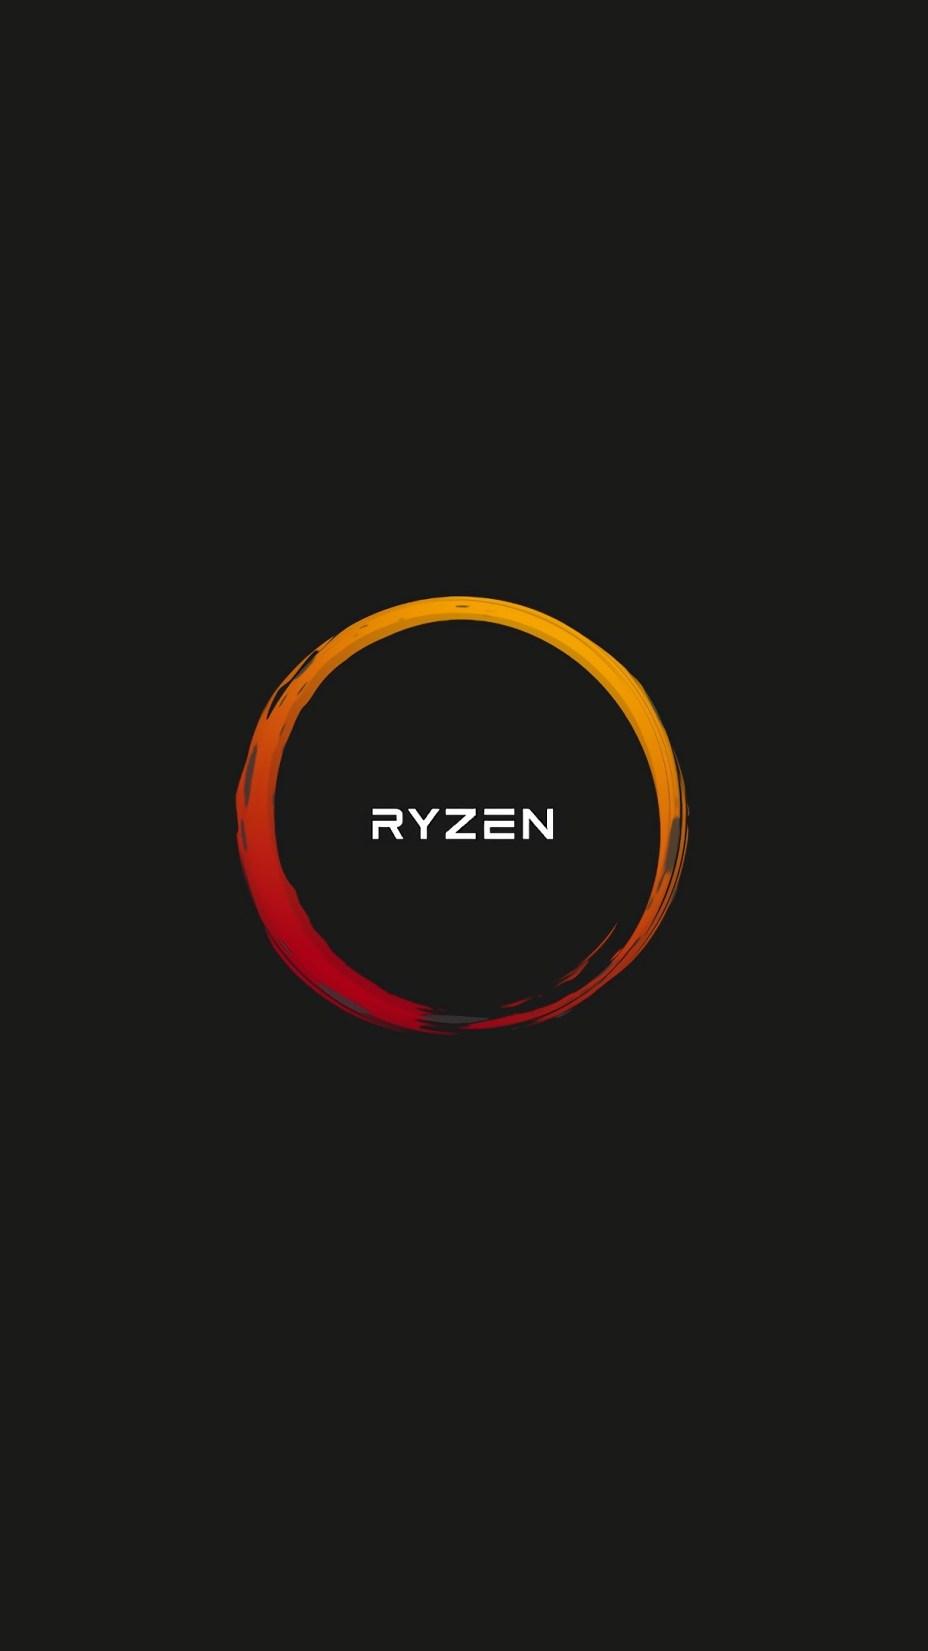 Ryzen Wallpaper 4k Wallpapers For Tech